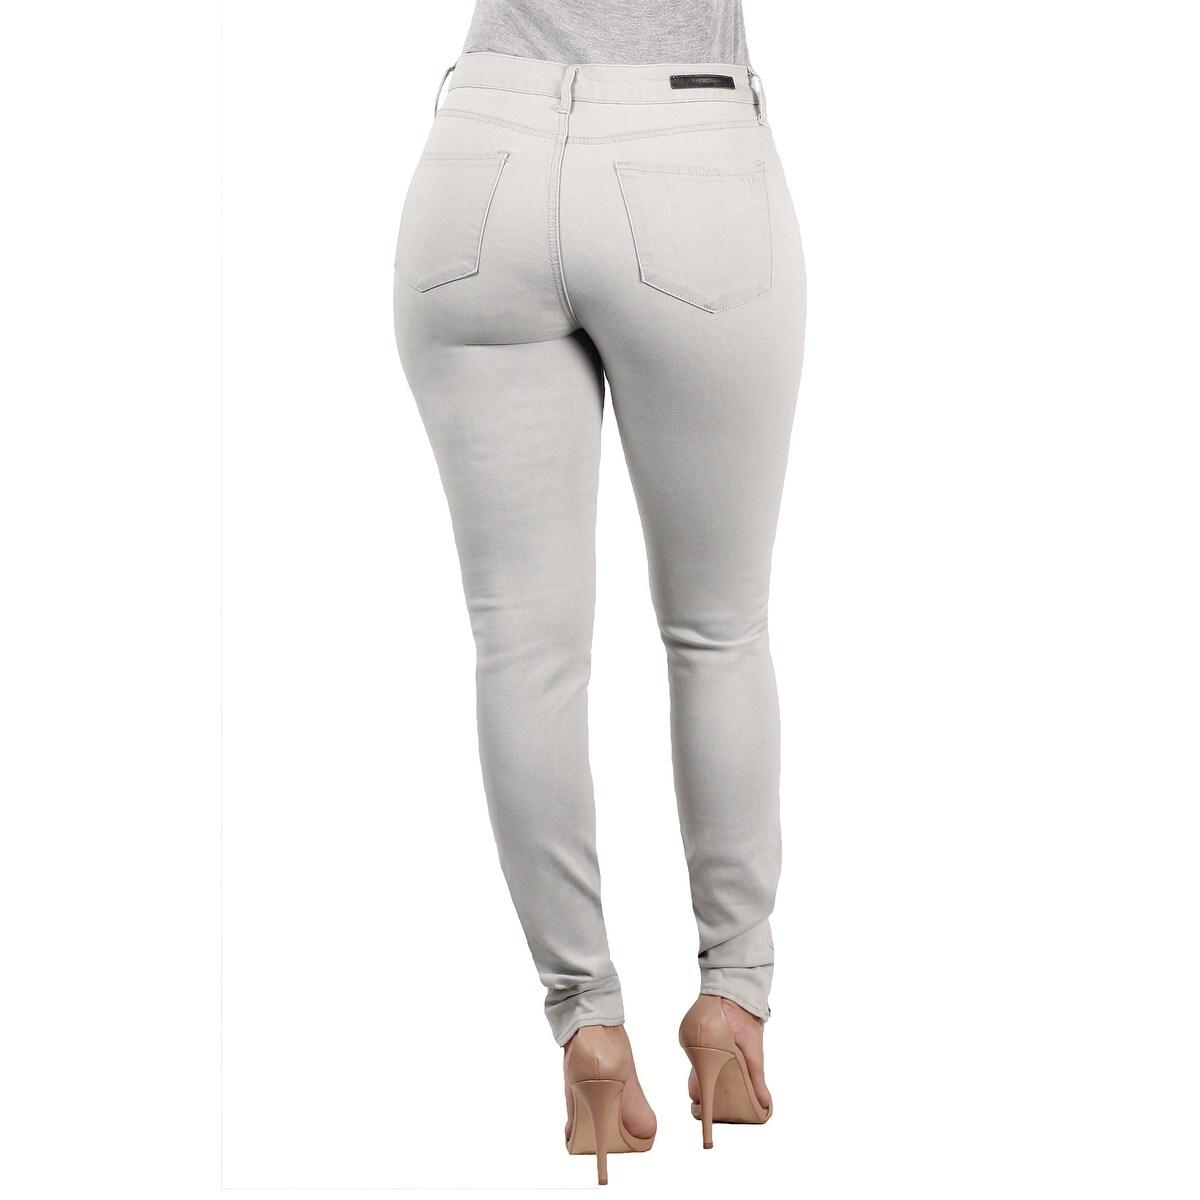 Versace 19.69 Abbigliamento Sportivo SRL Ladies Contemporary Skinny-Stretch  Panel Jean - Free Shipping Today - Overstock.com - 23839535